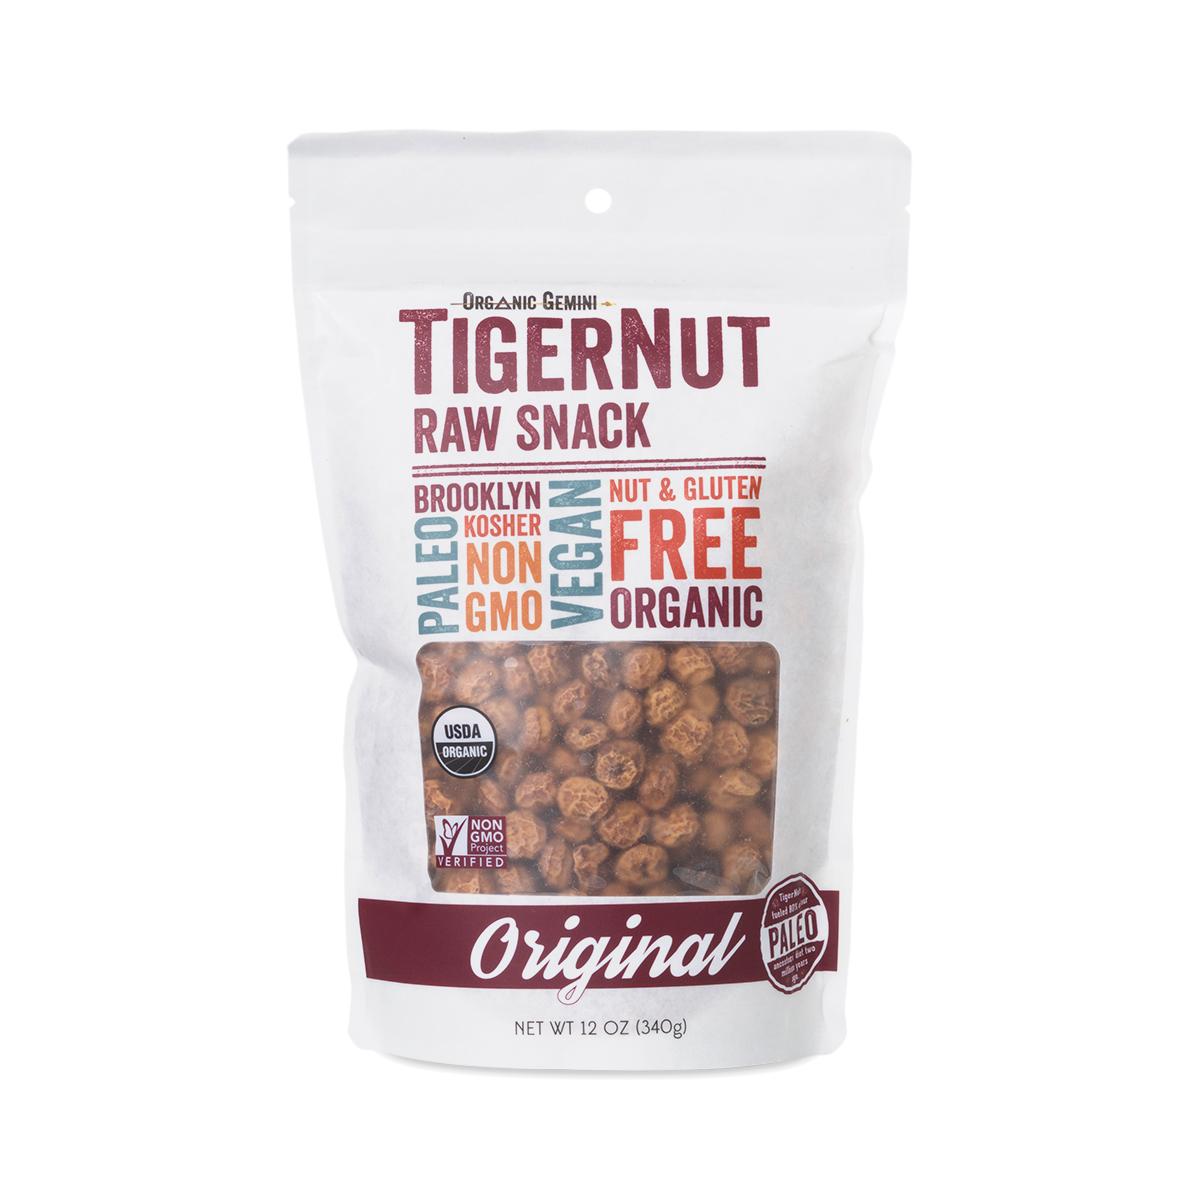 Organic Gemini TigerNut Raw Snack 12 oz pouch